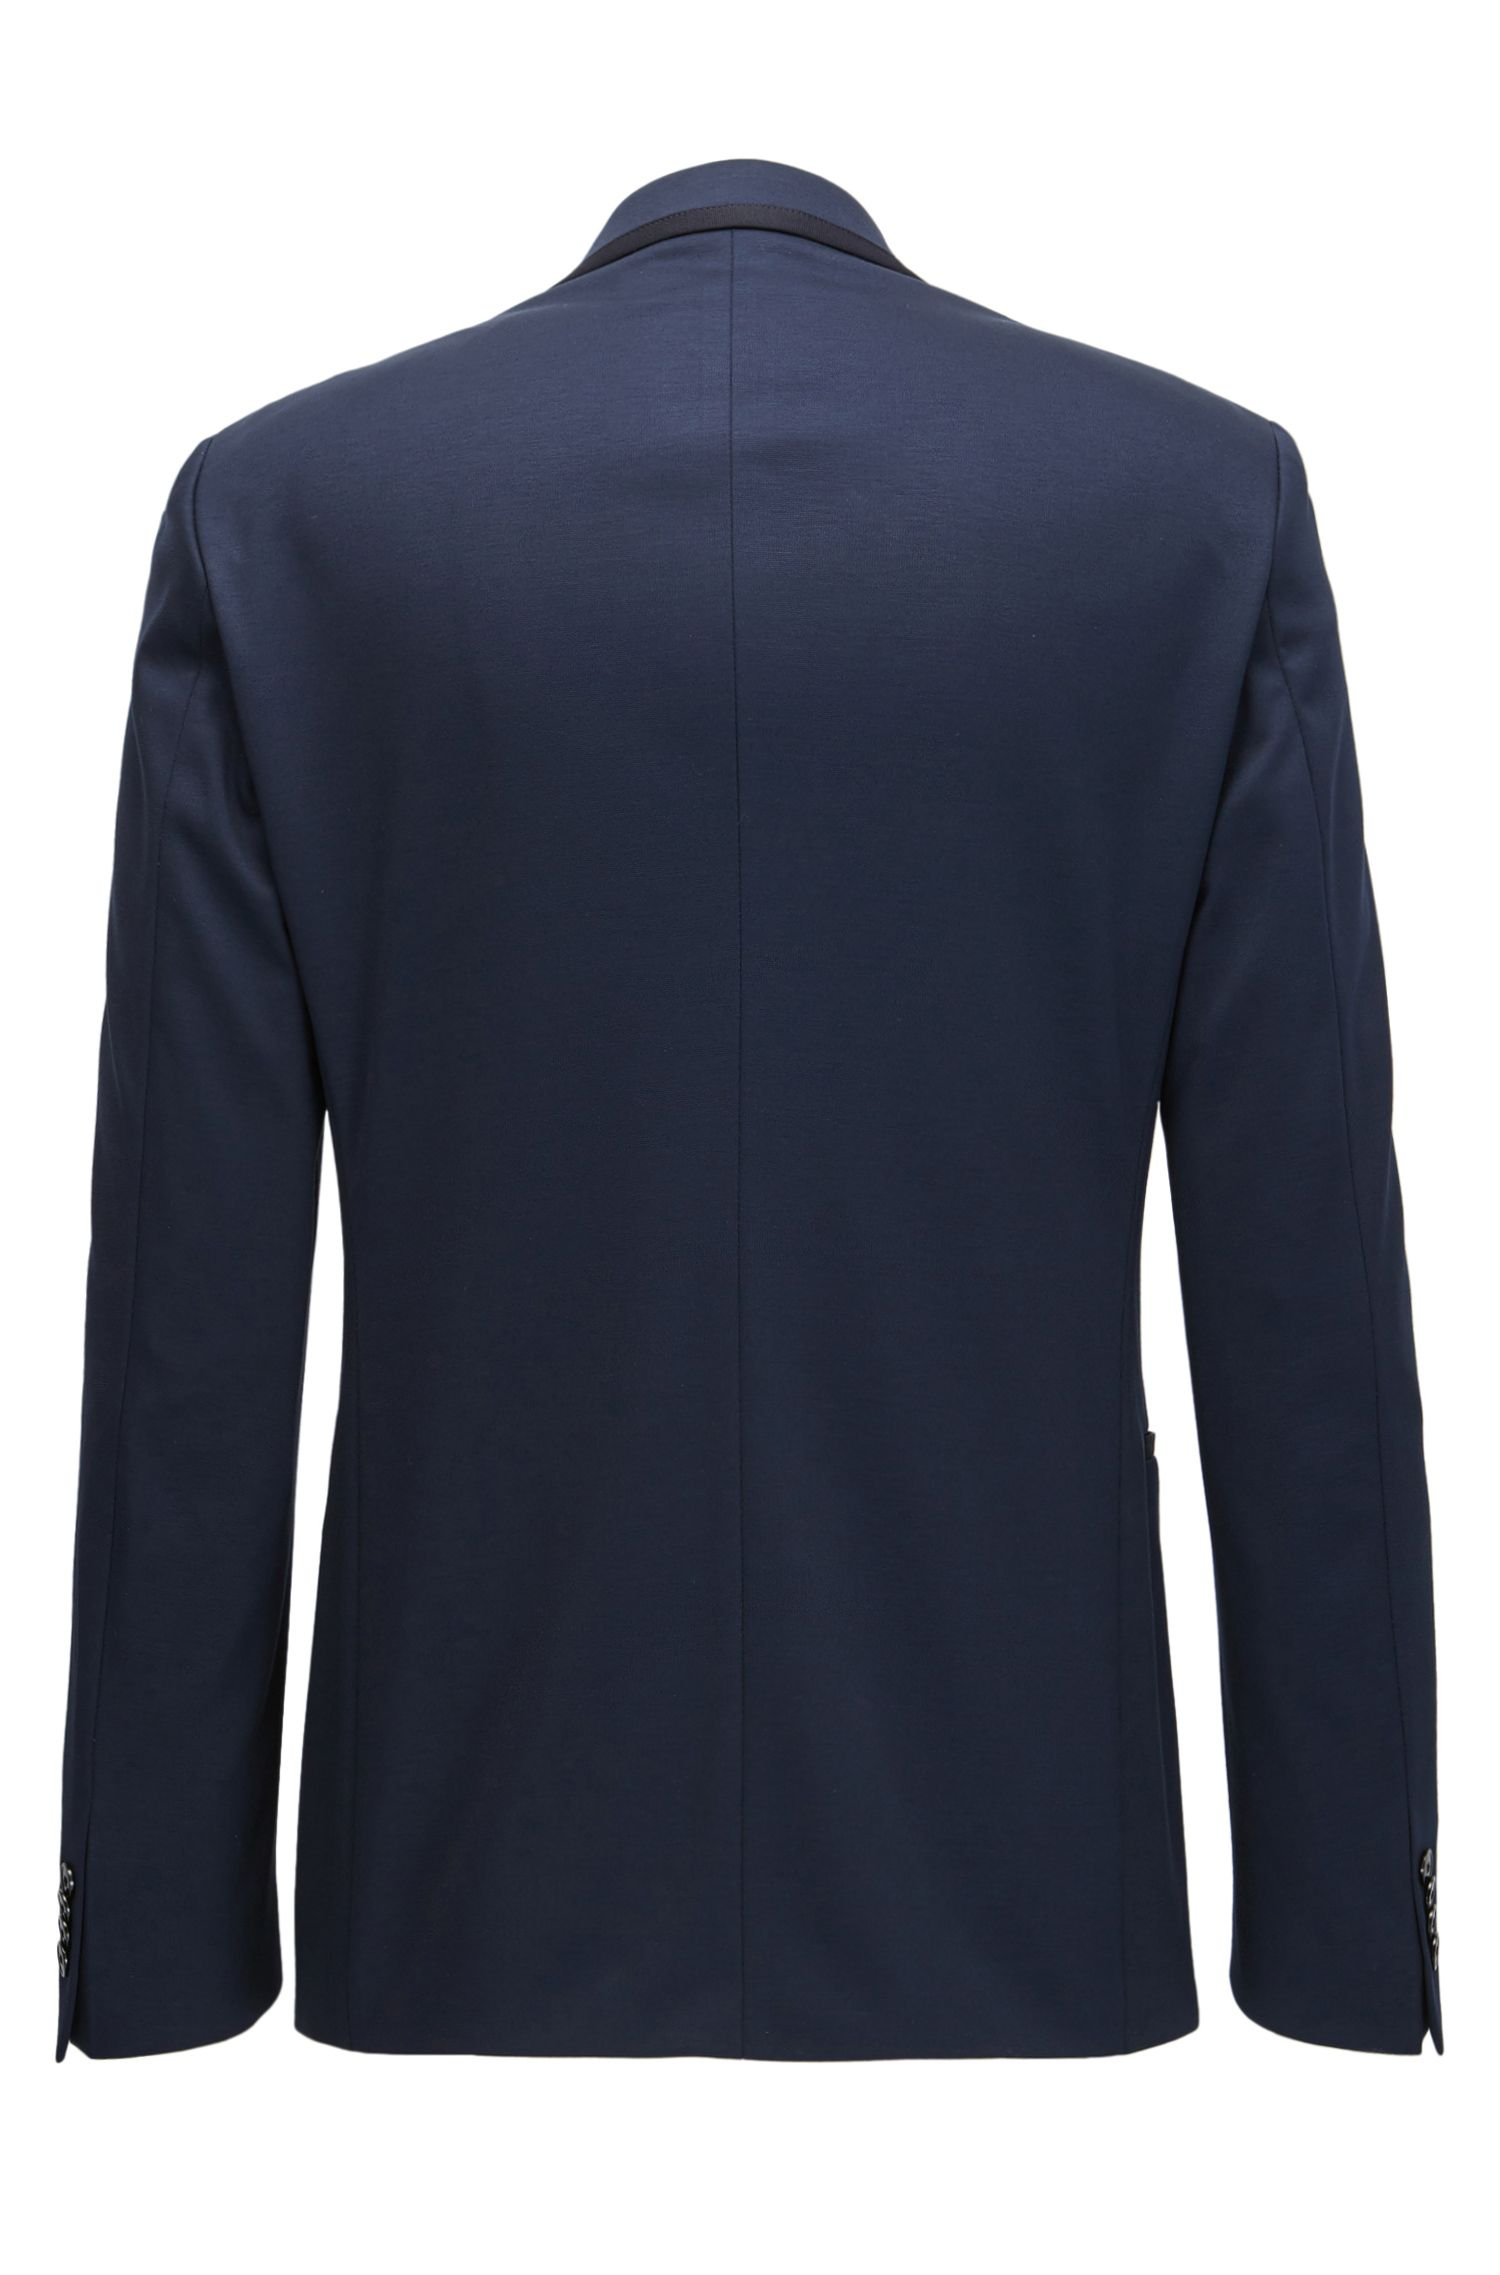 Stretch Tailoring Jersey Tuxedo, Slim Fit | Novan/Ben, Dark Blue